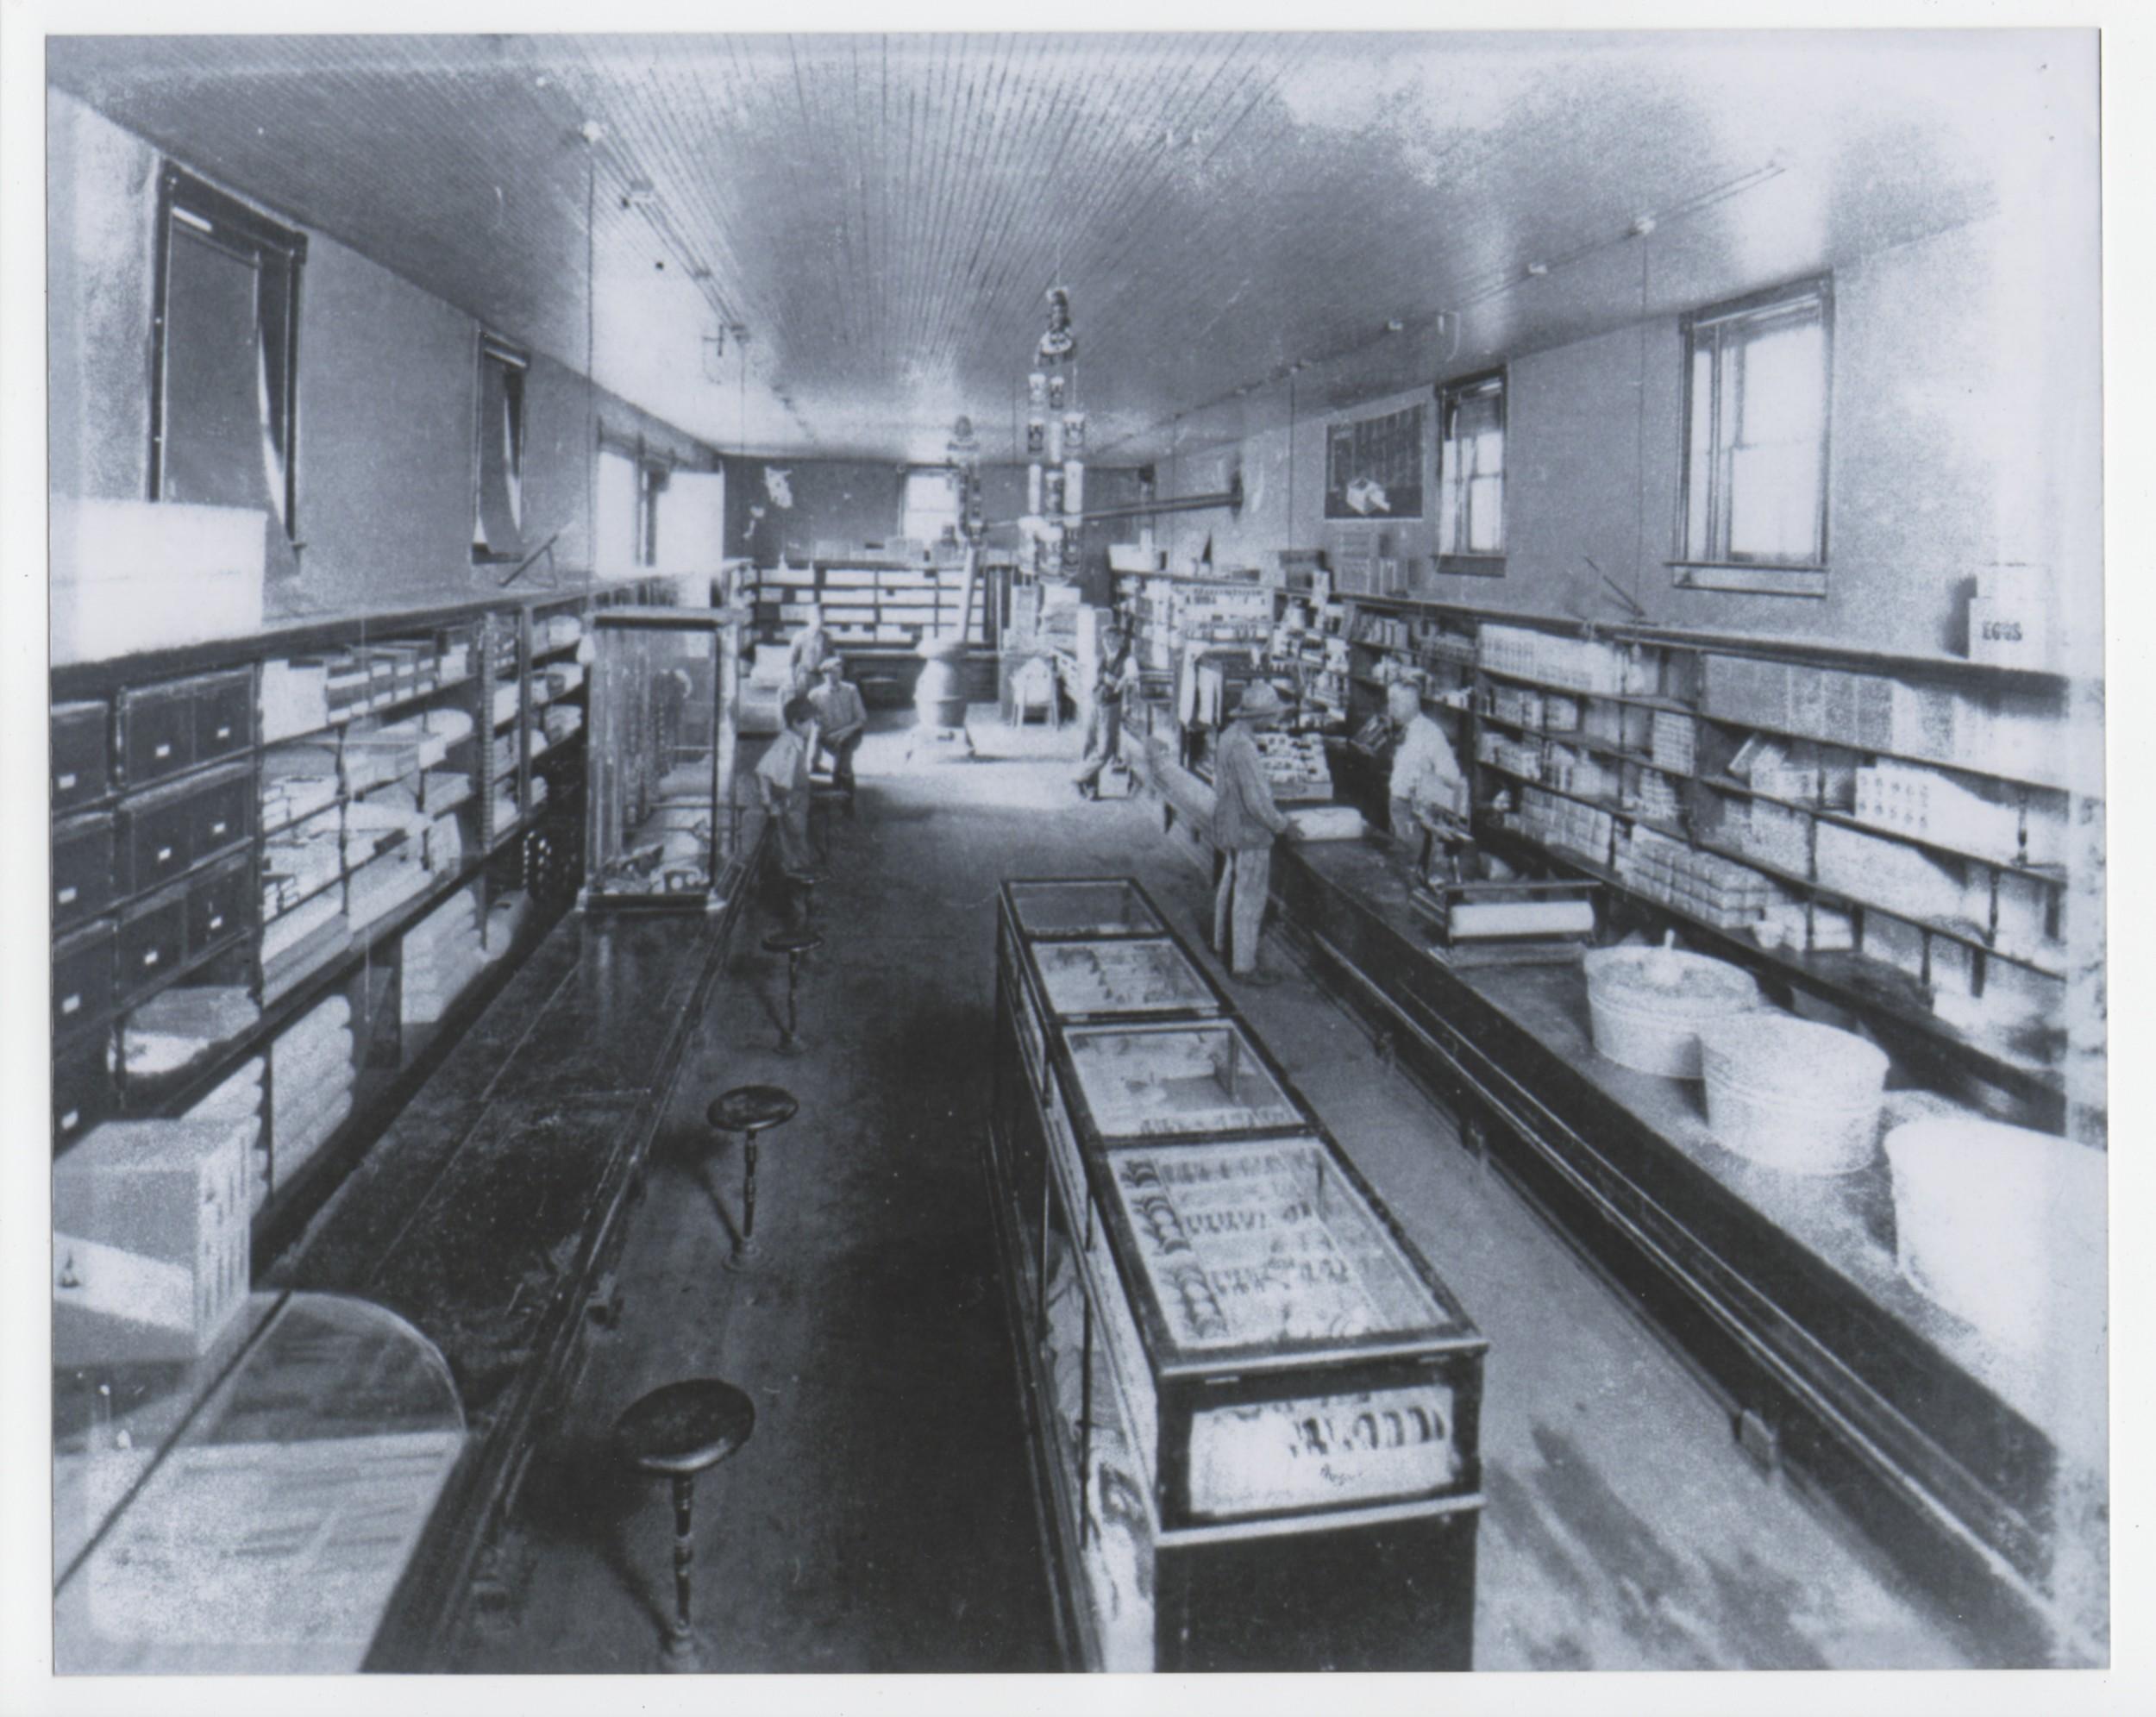 Phenix General Store, no date